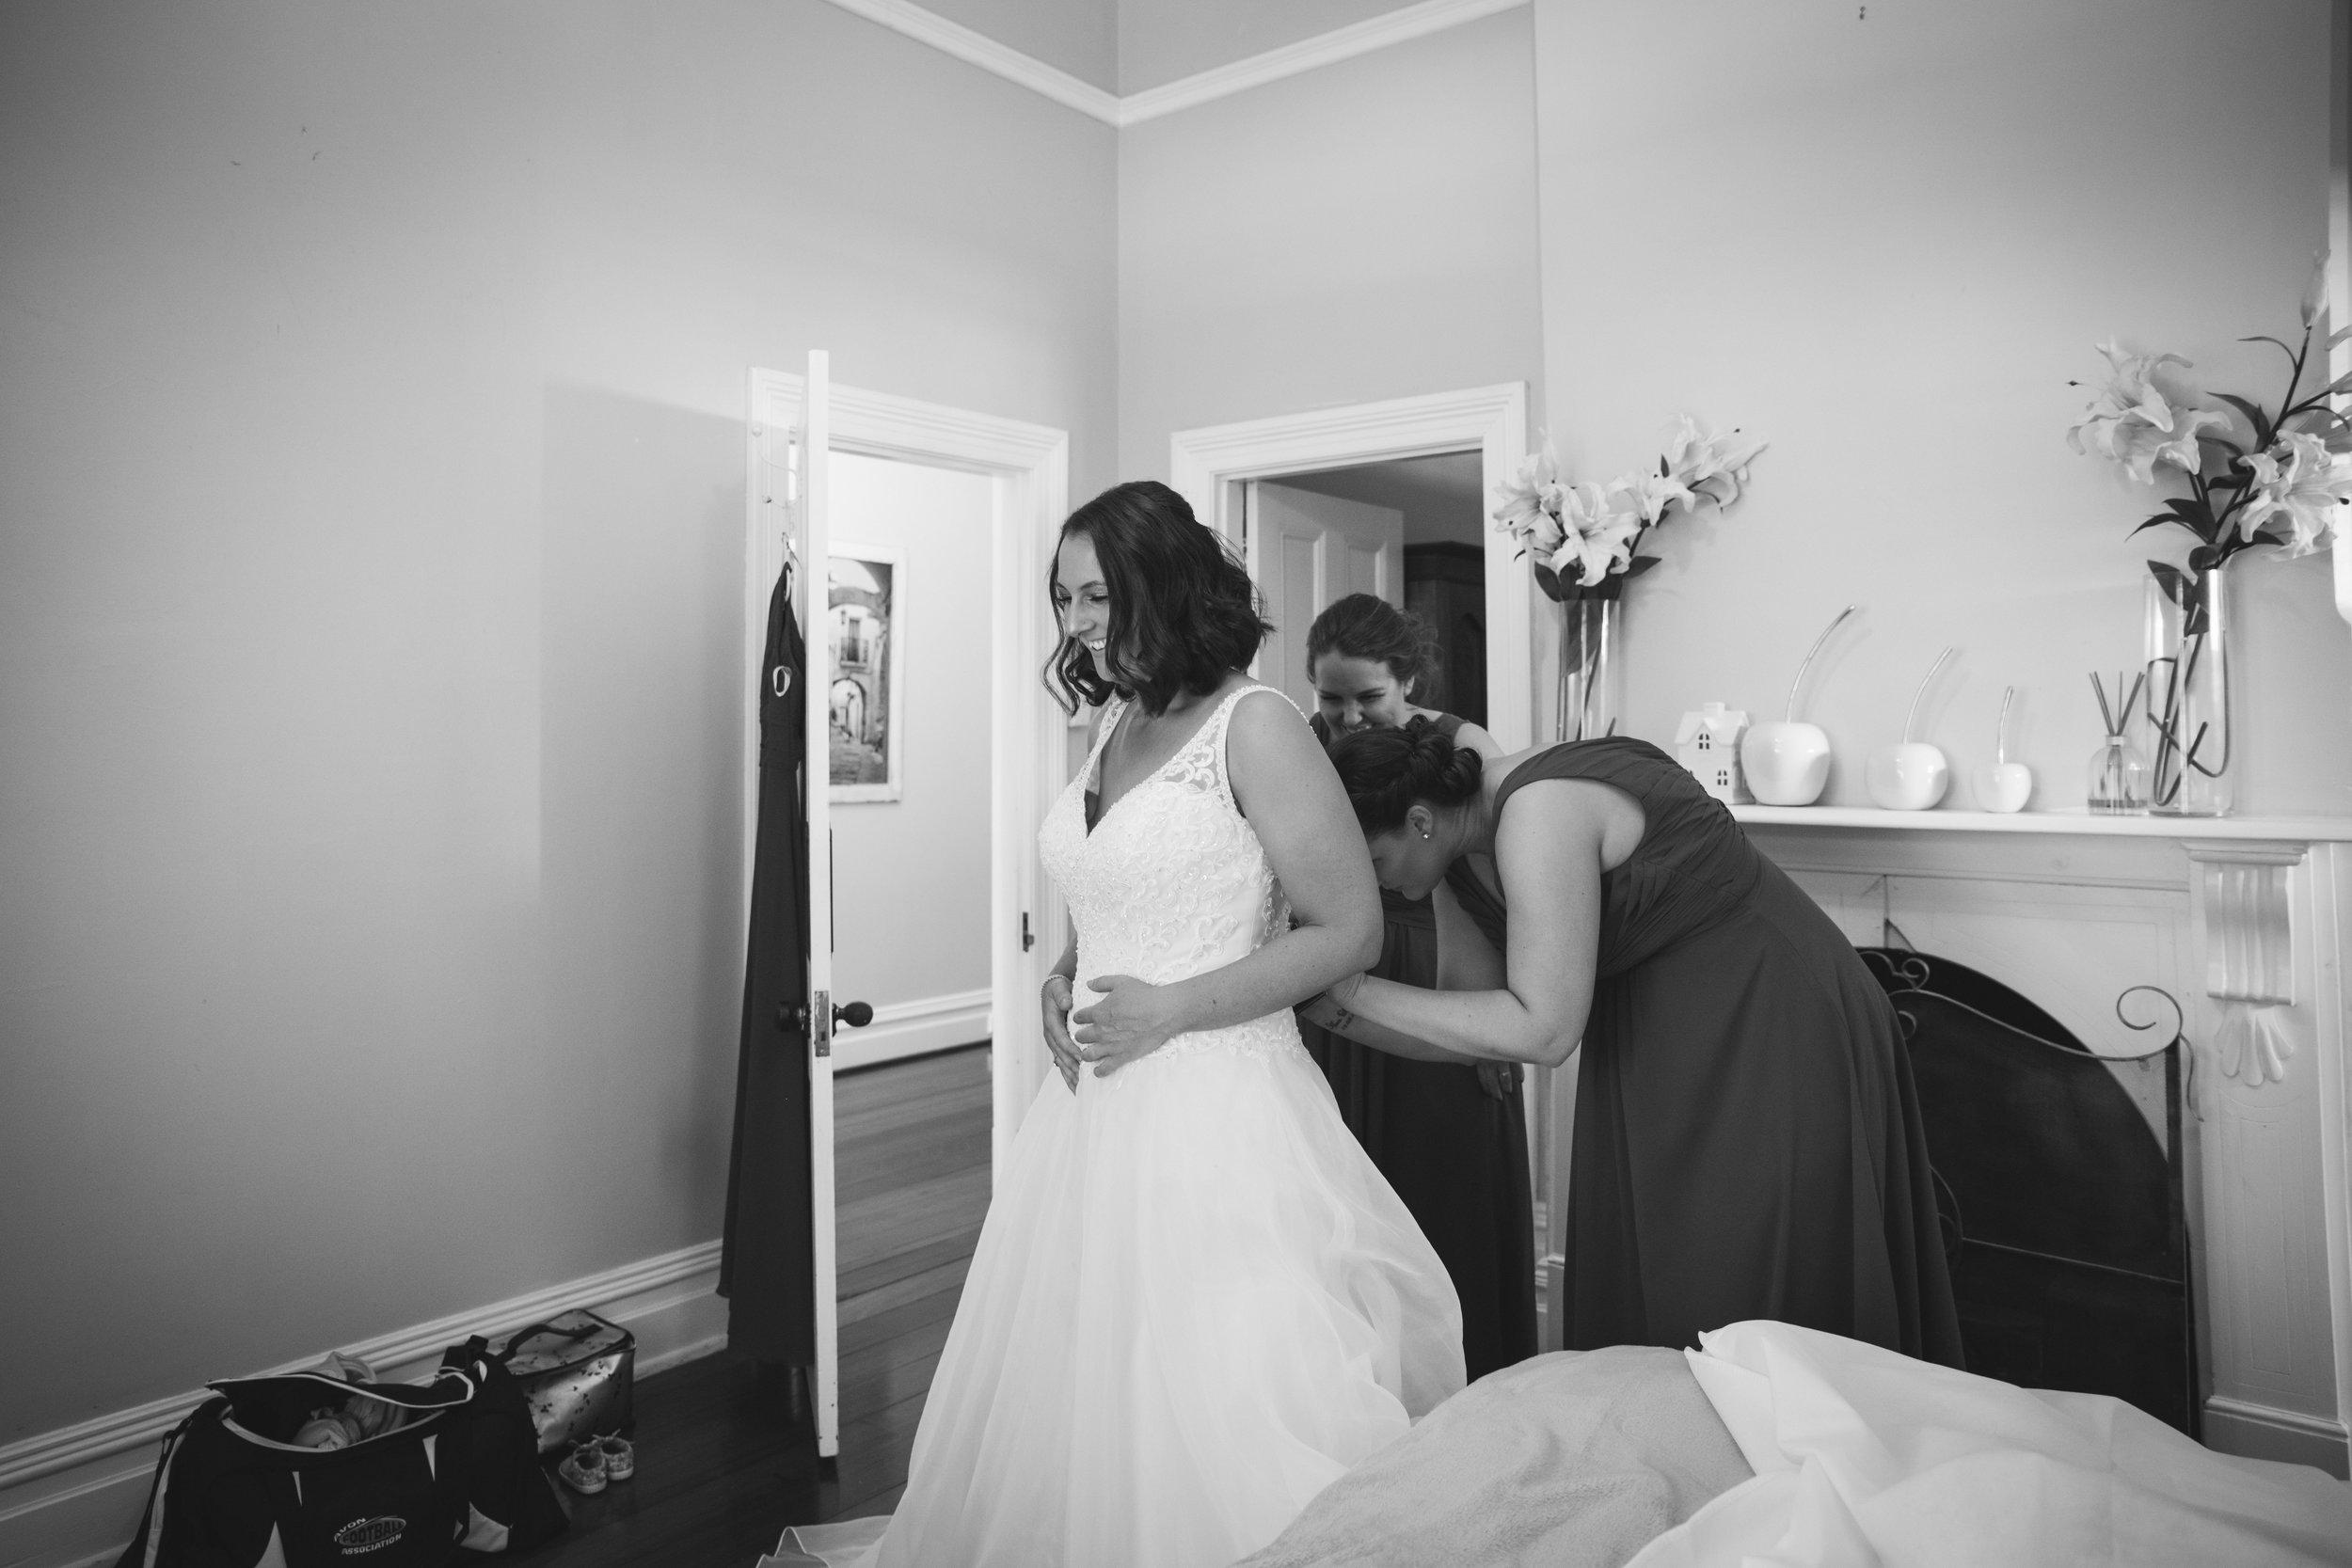 Angie Roe Photography Wheatbelt Avon Valley Farm Wedding (7).jpg